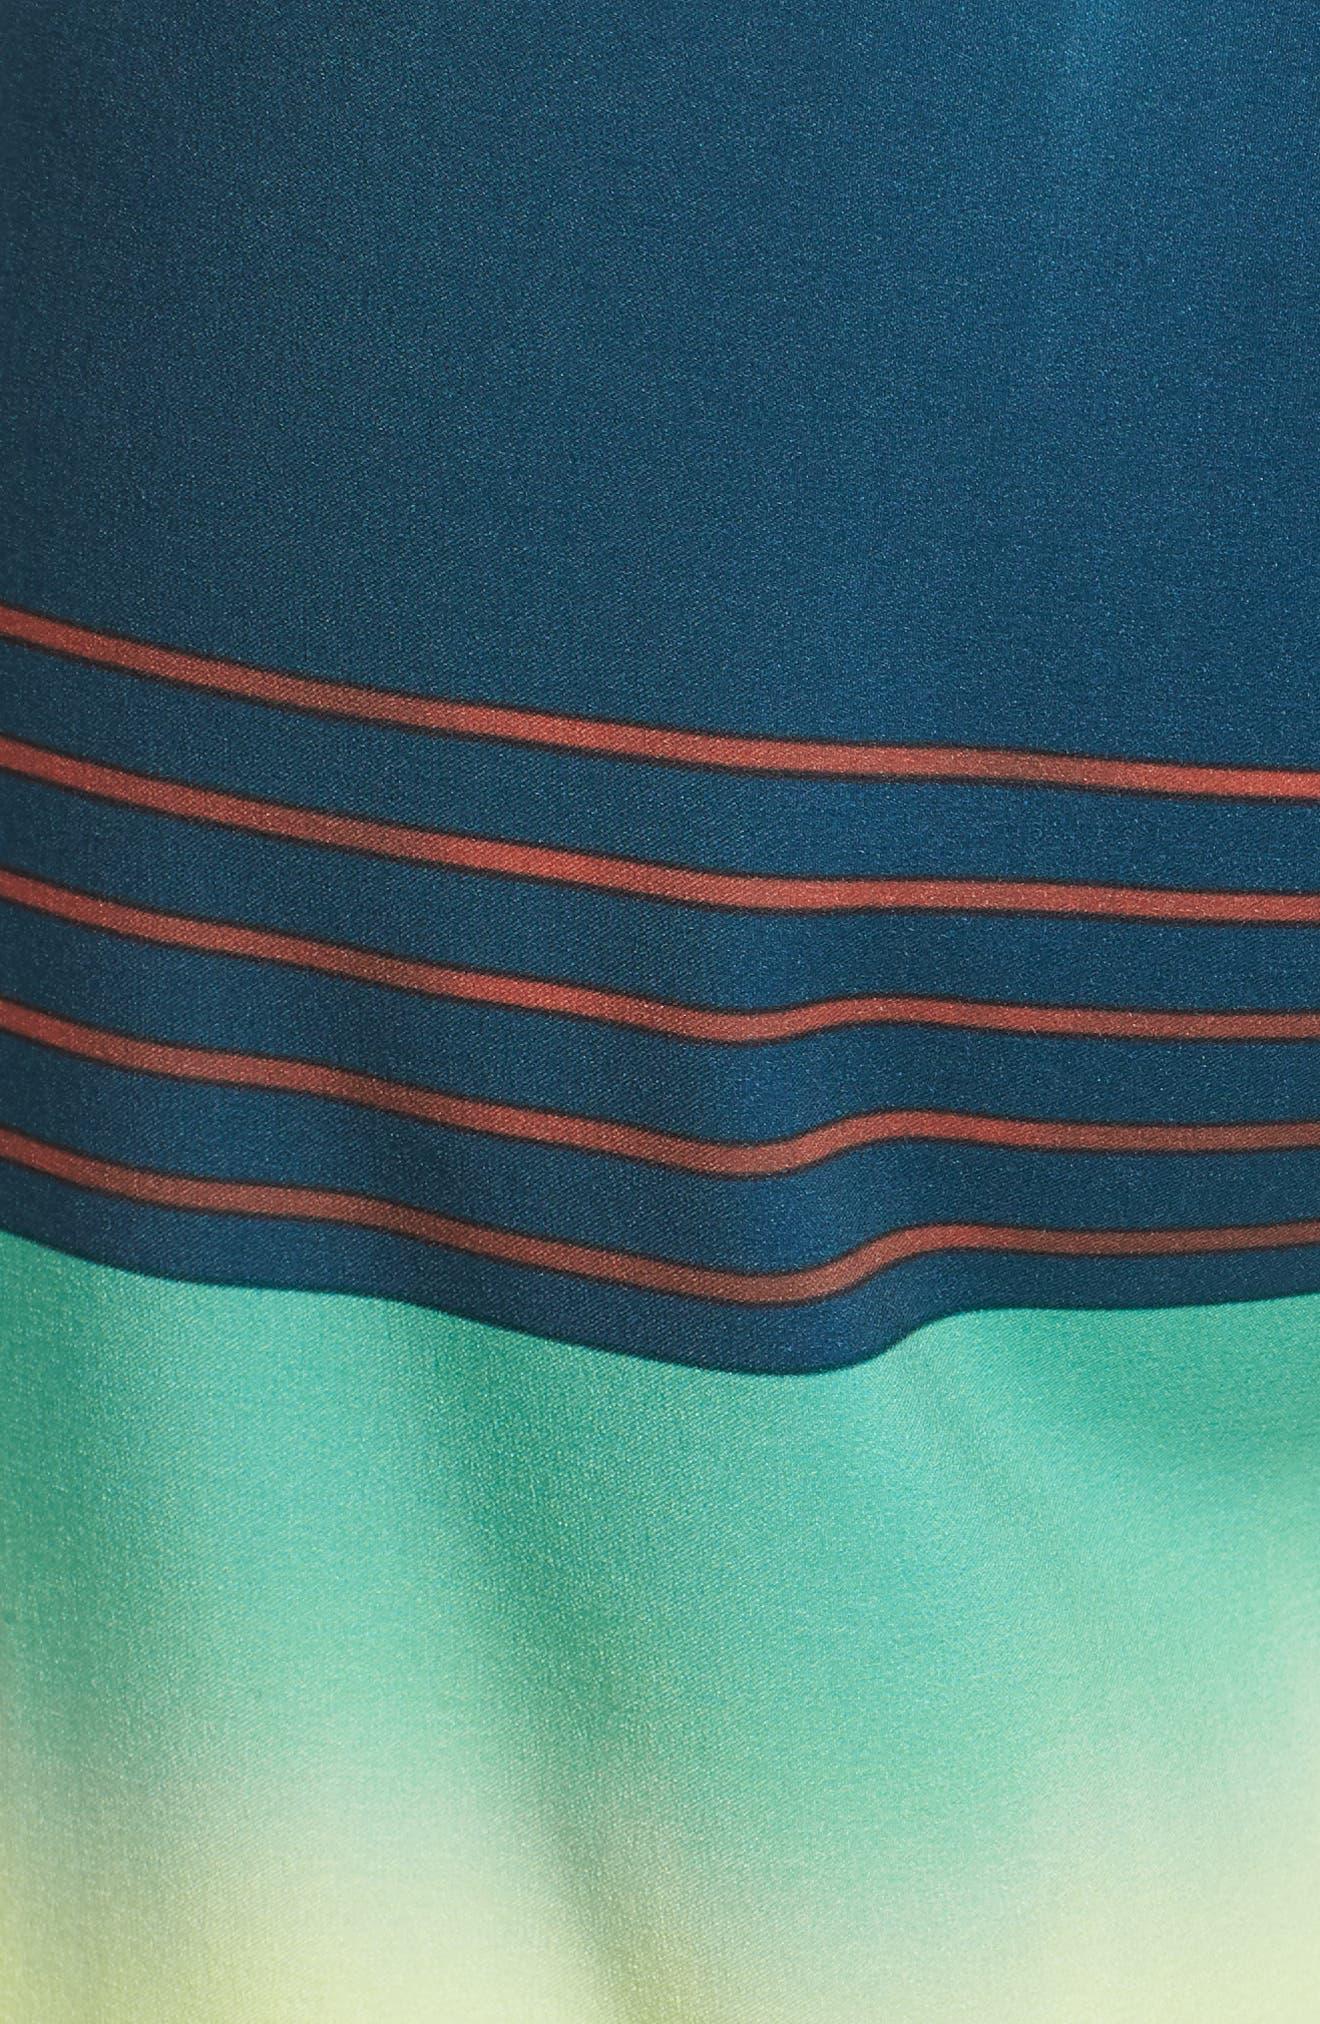 Hyperfreak Heist Board Shorts,                             Alternate thumbnail 5, color,                             DARK BLUE